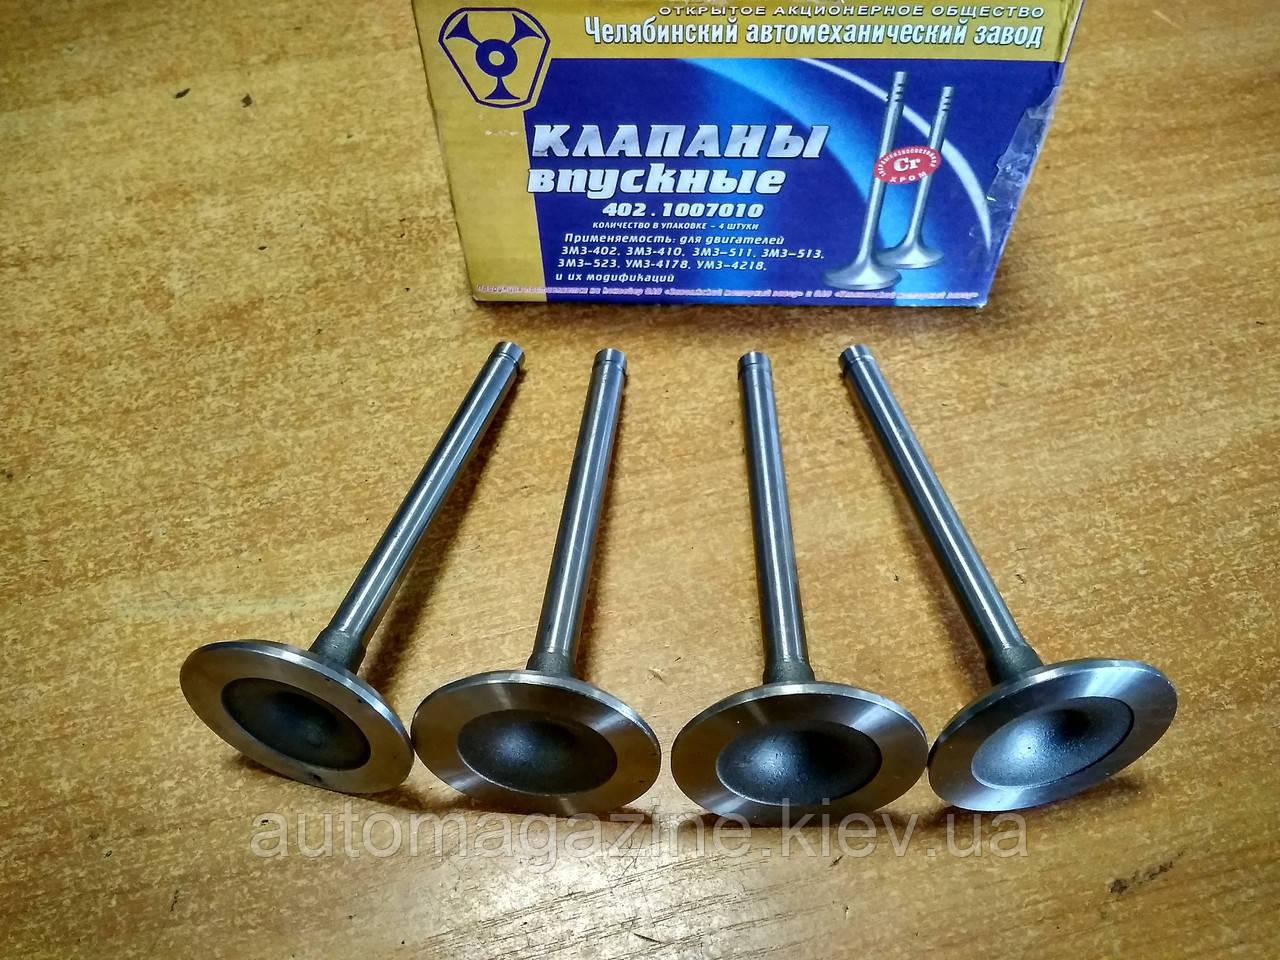 Клапани впускні Газель, УАЗ, Волга (402-й двигун)